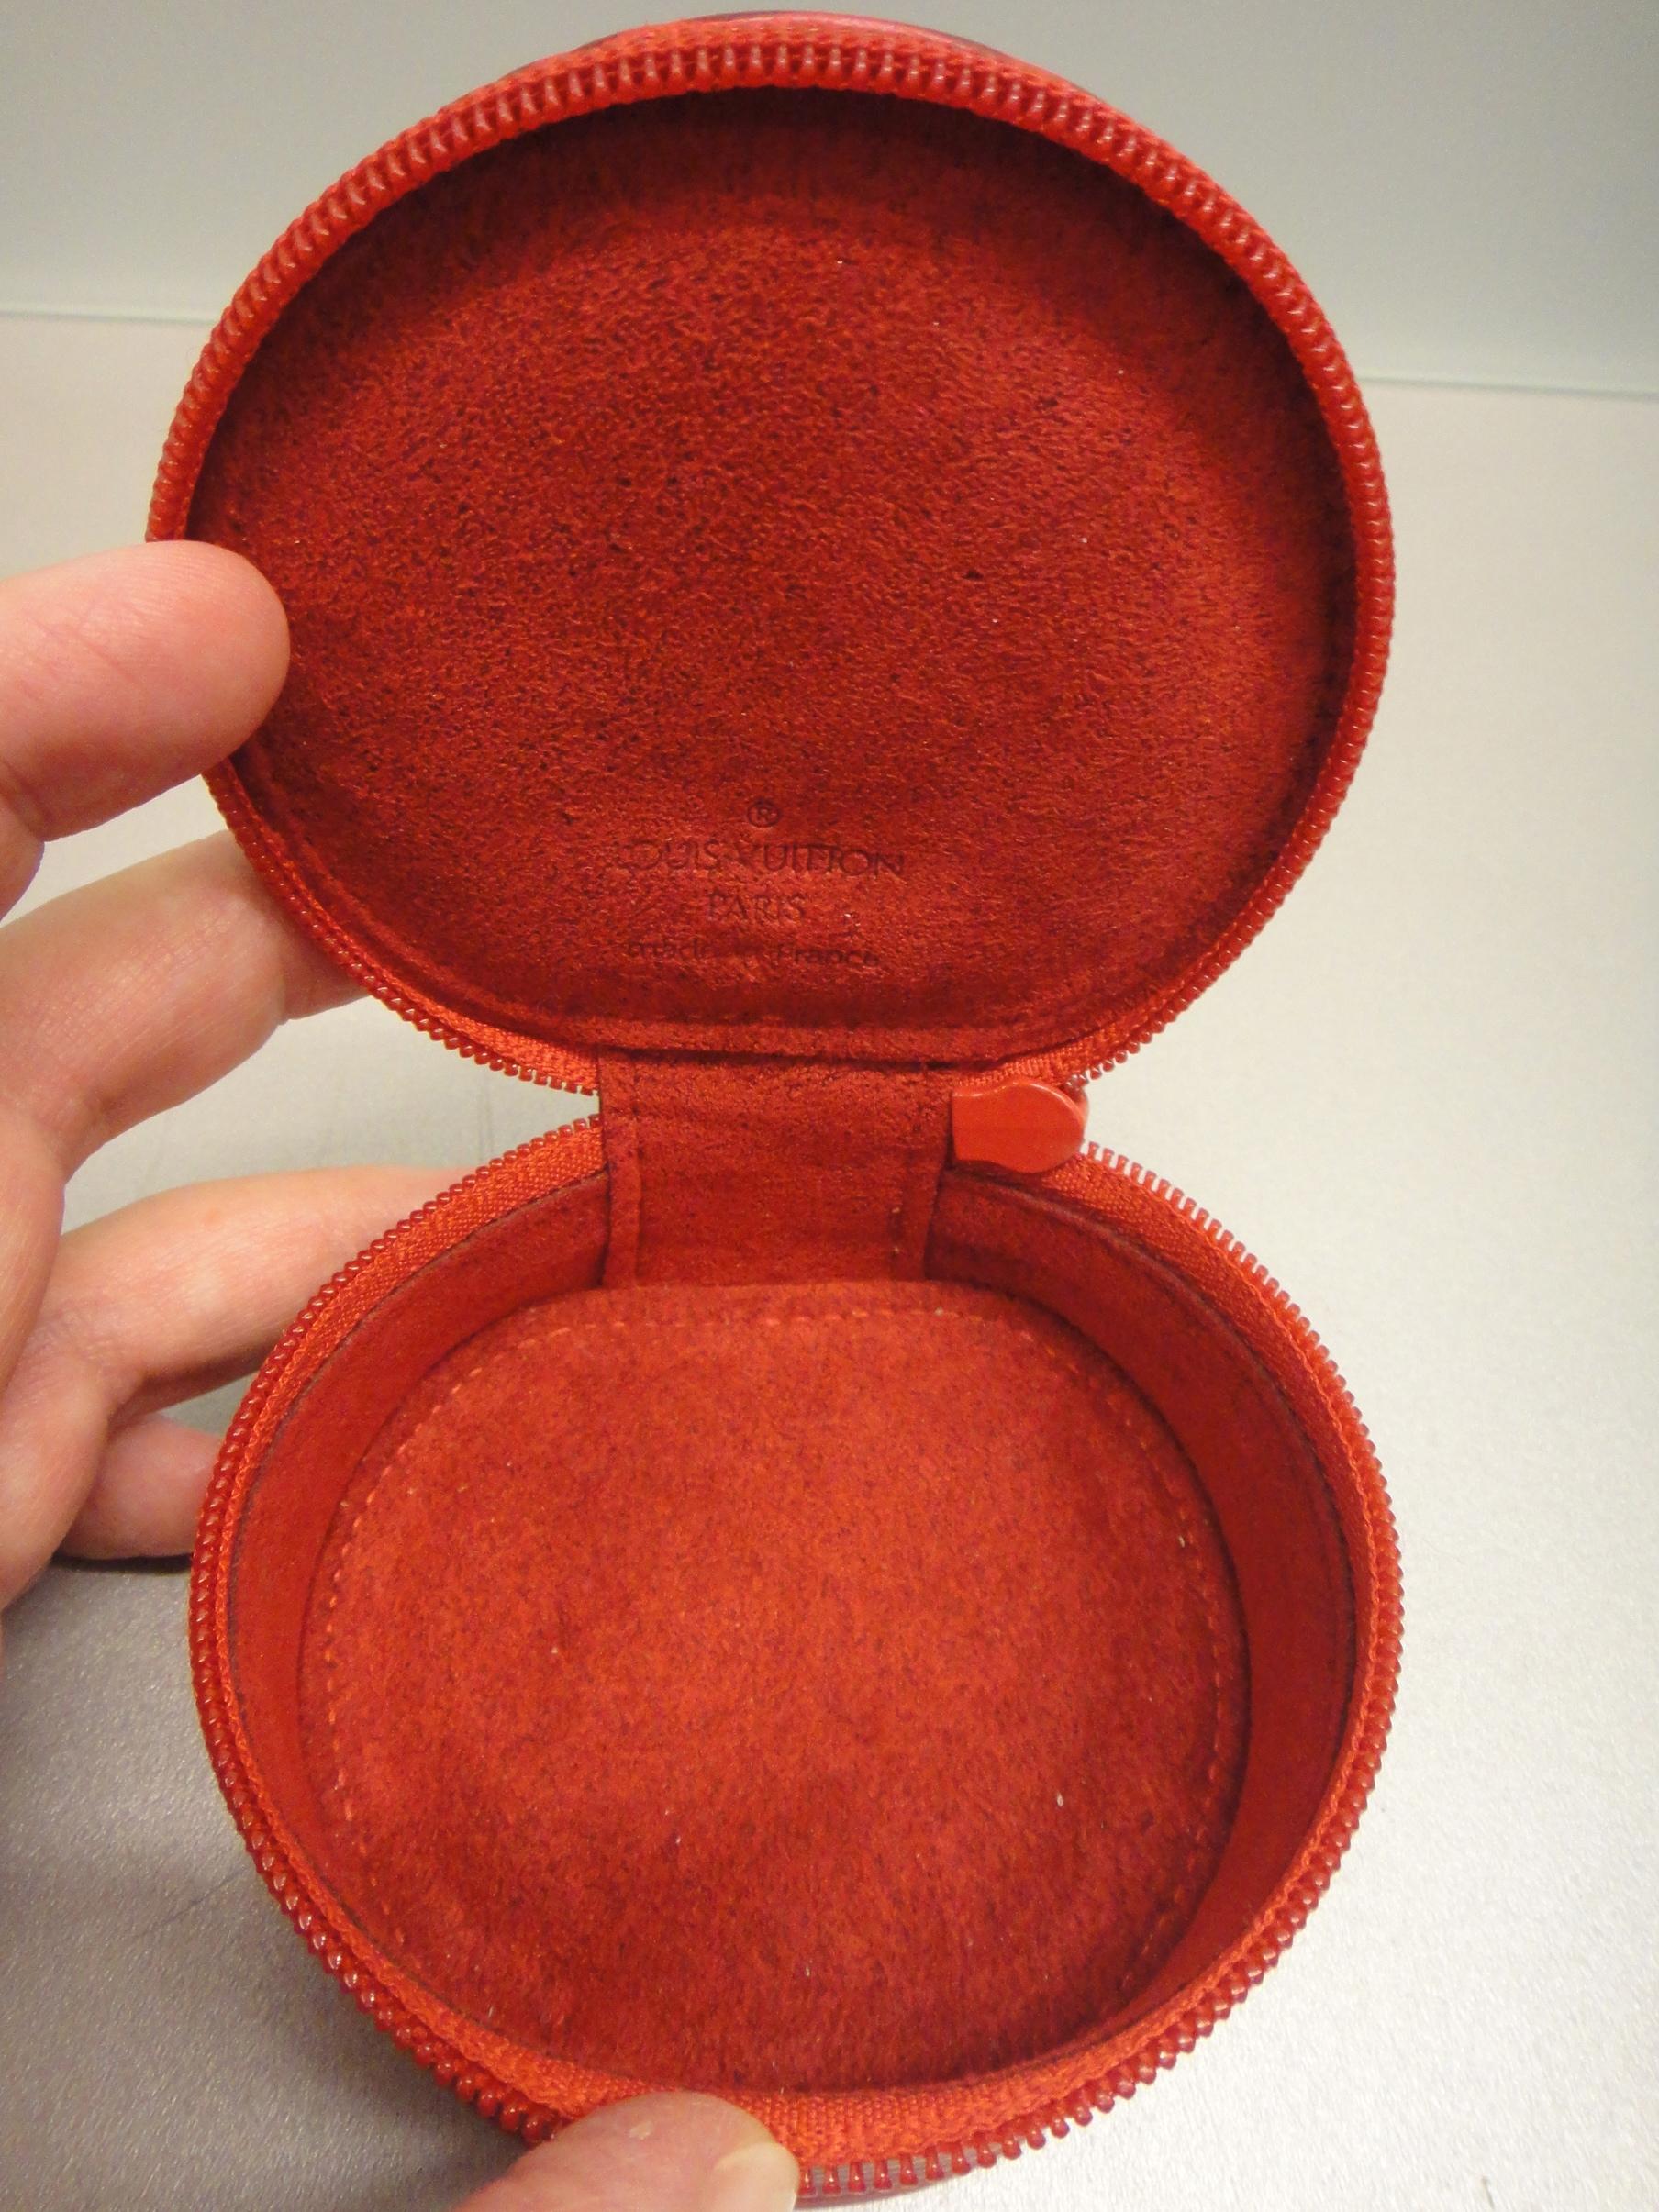 inside small jewelry box / das Innere der kleinen Schmuckschatulle